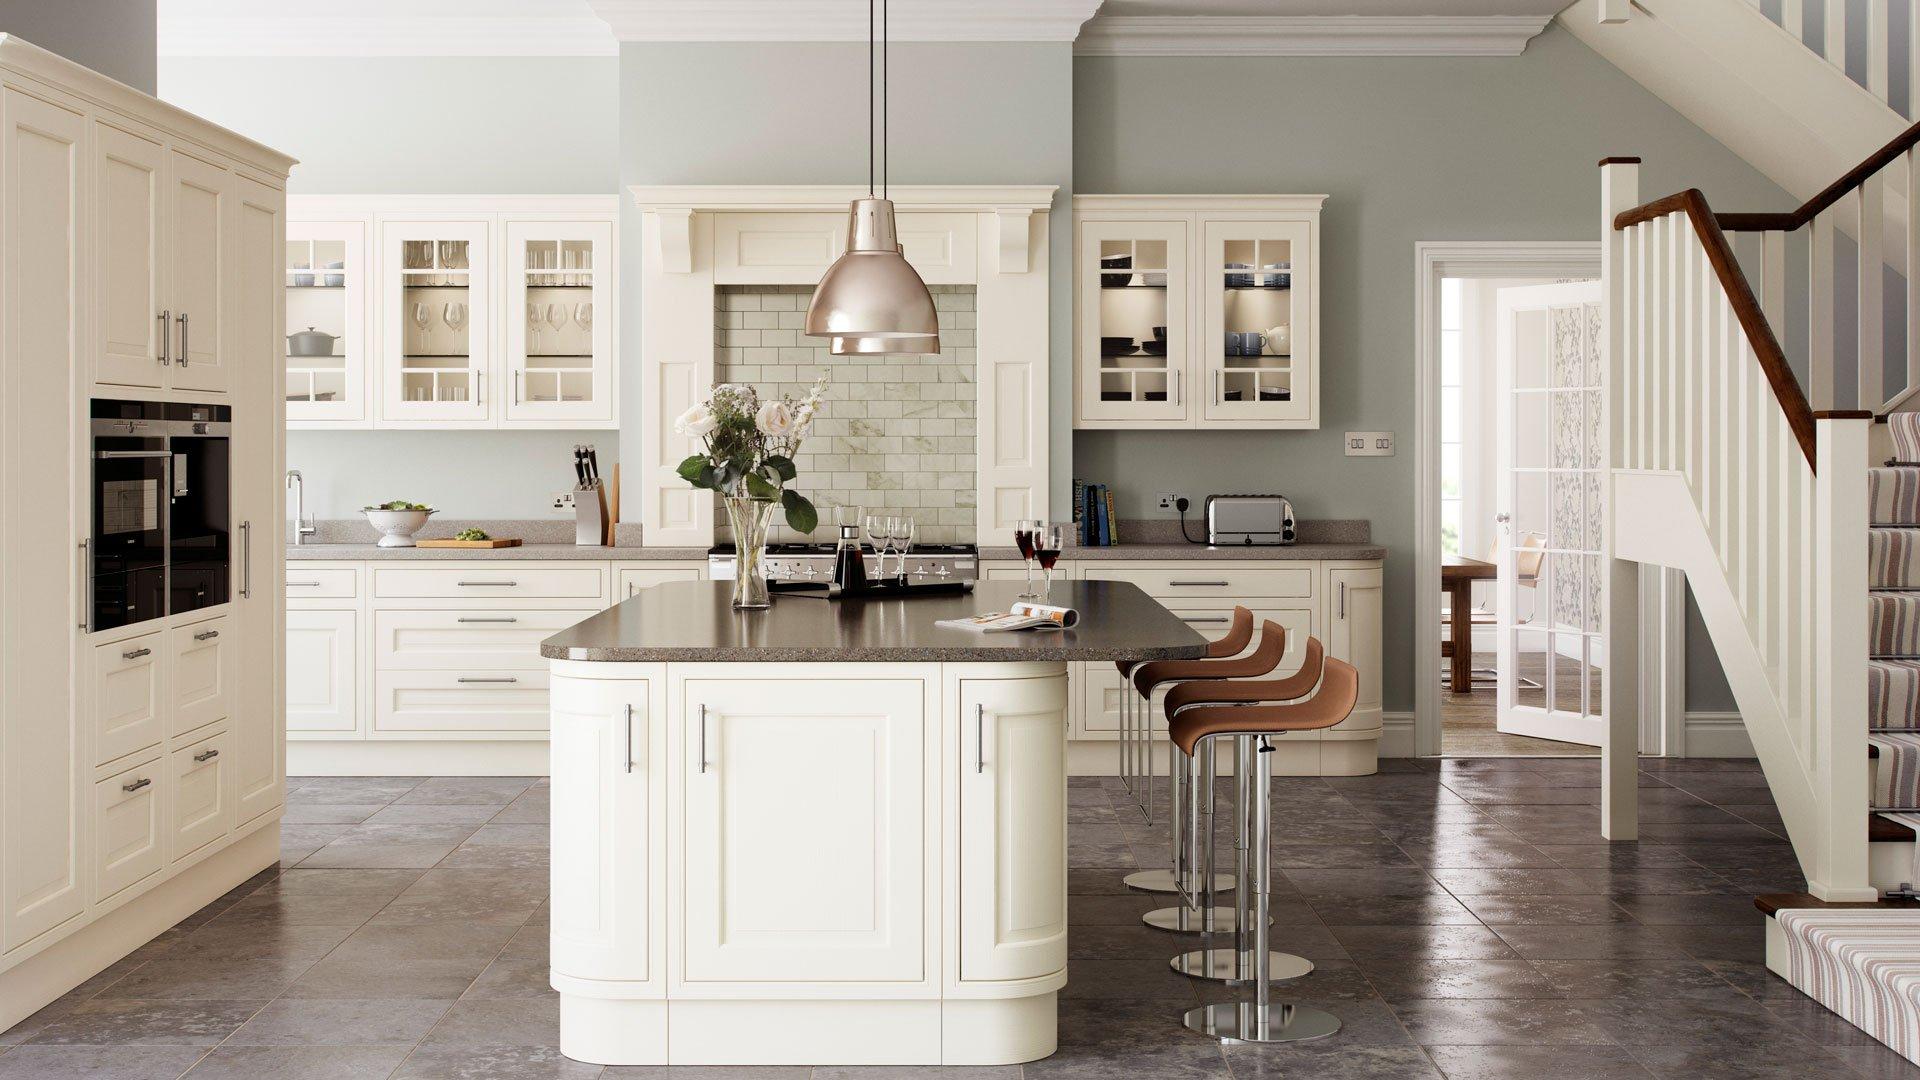 Multiwood Eildon Ash Painted Kitchen